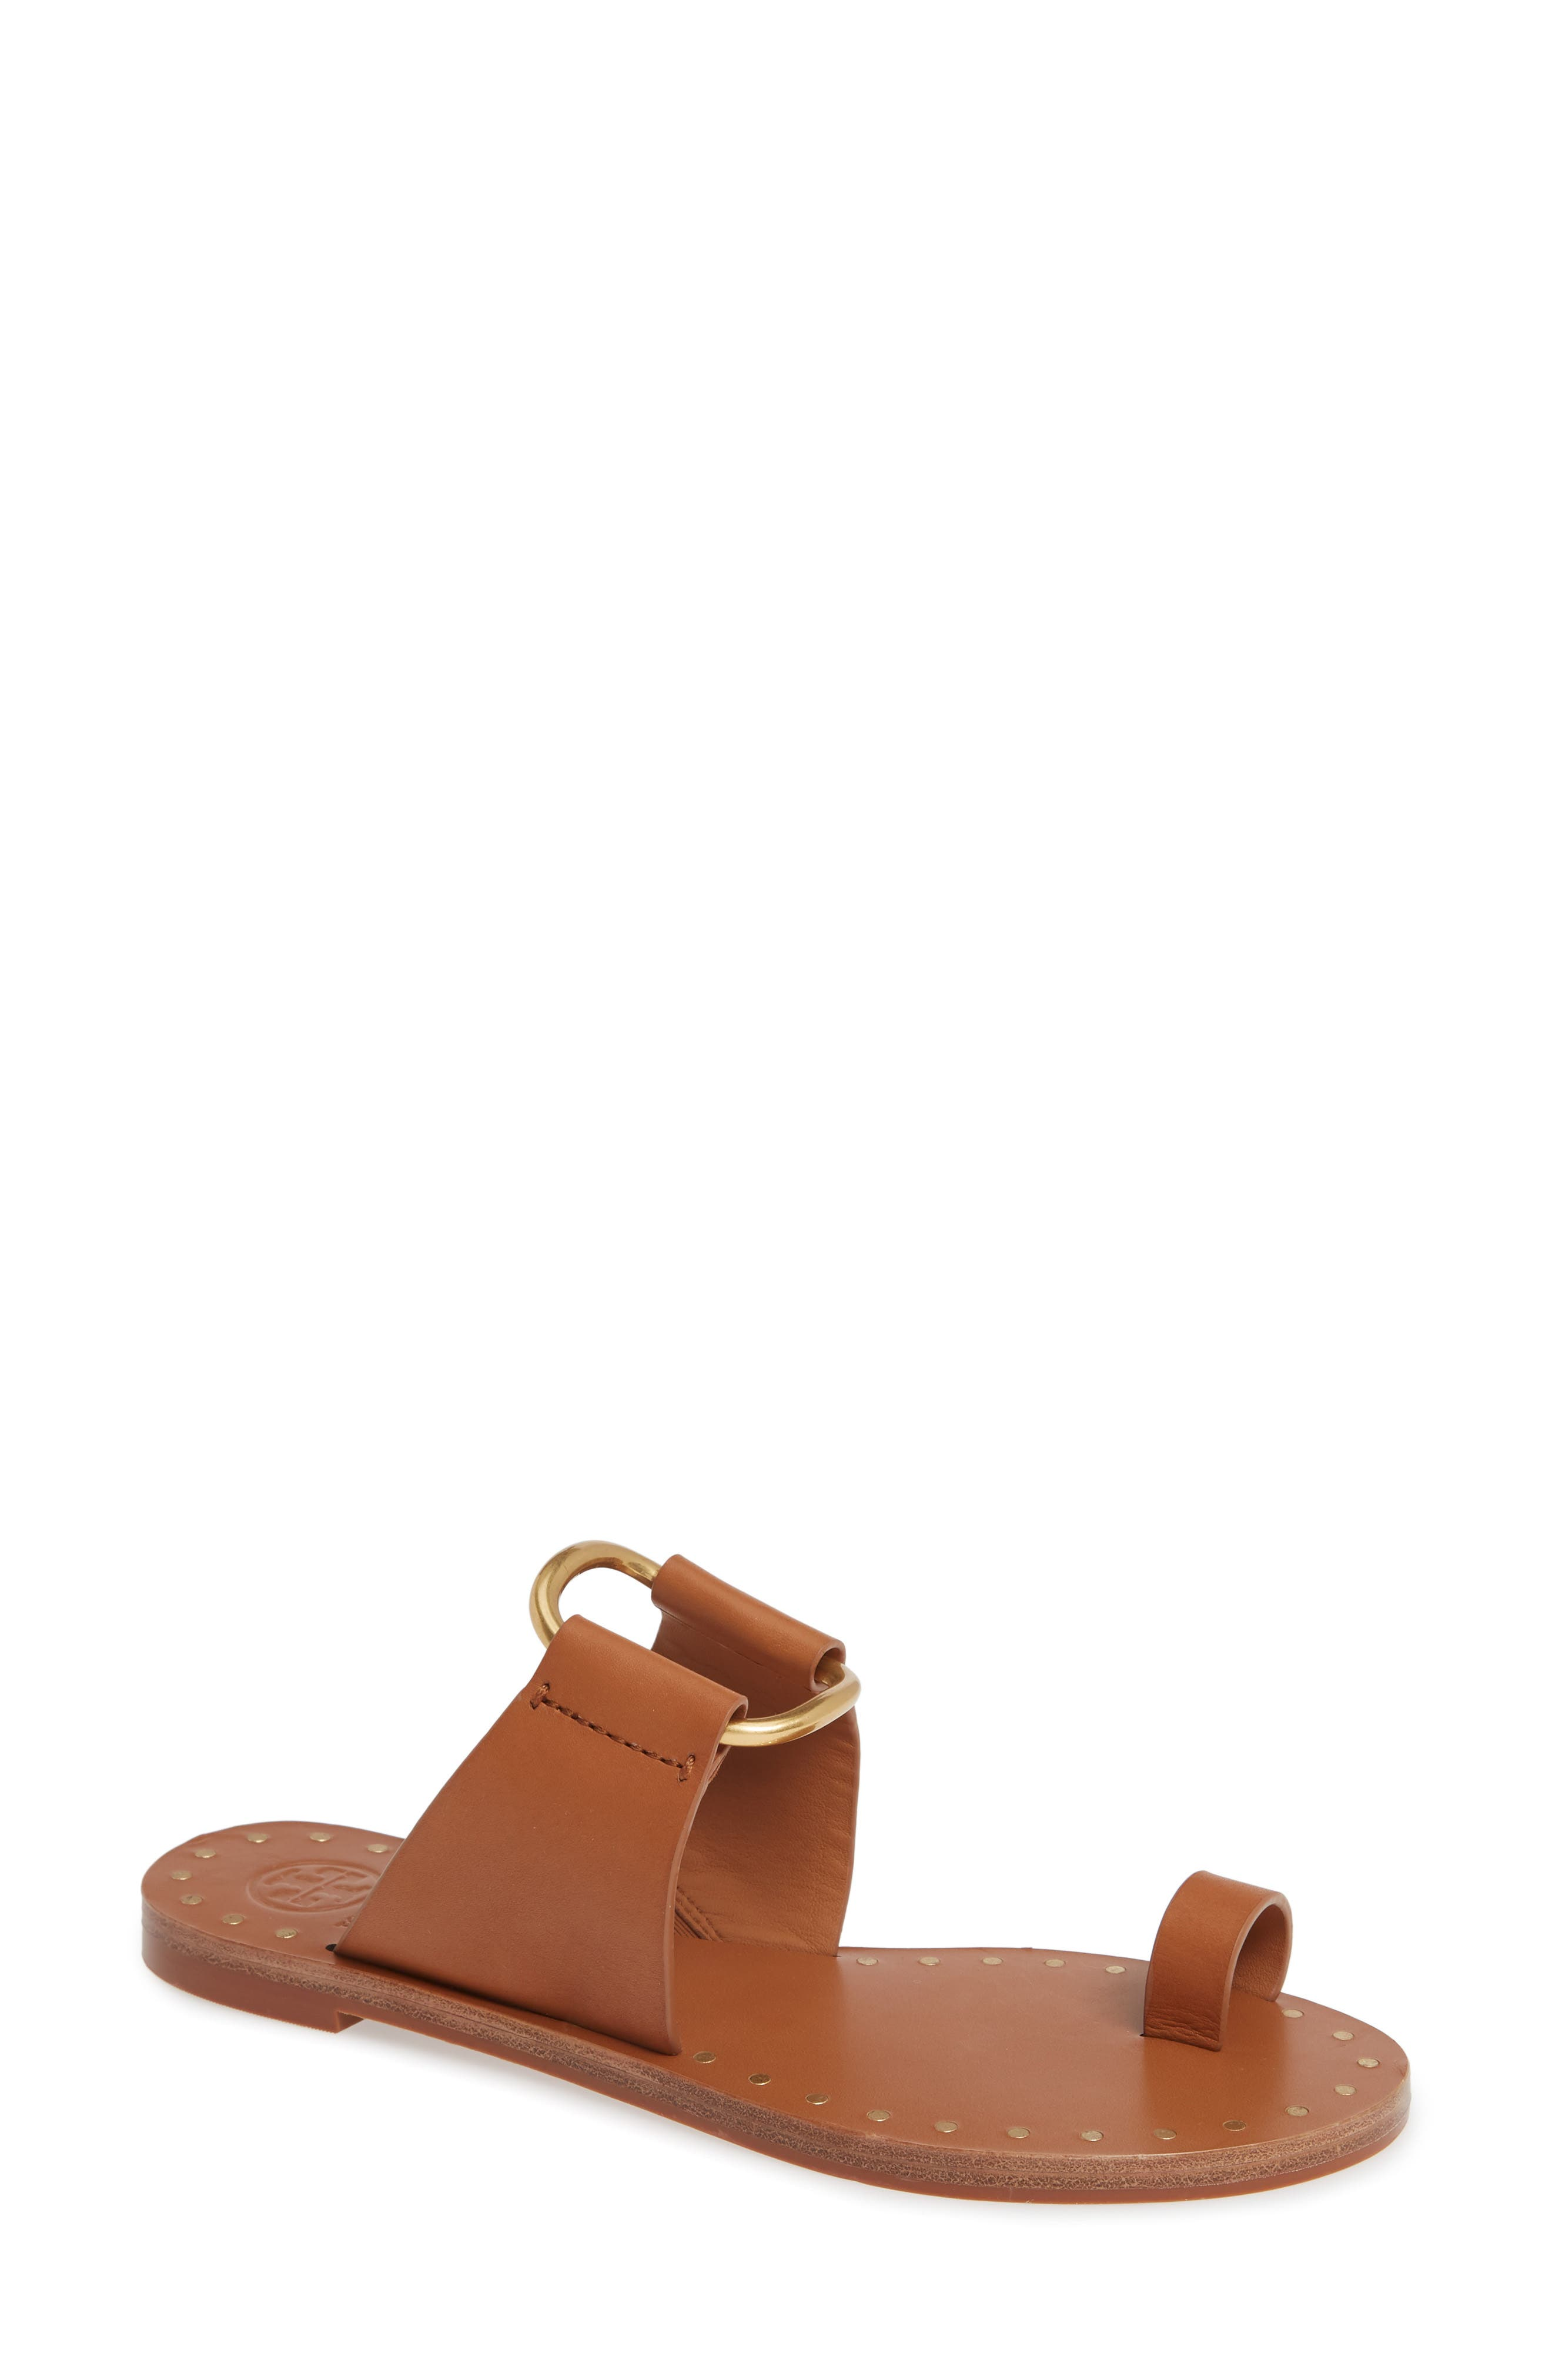 Tory Burch Ravello Toe Ring Sandal, Brown